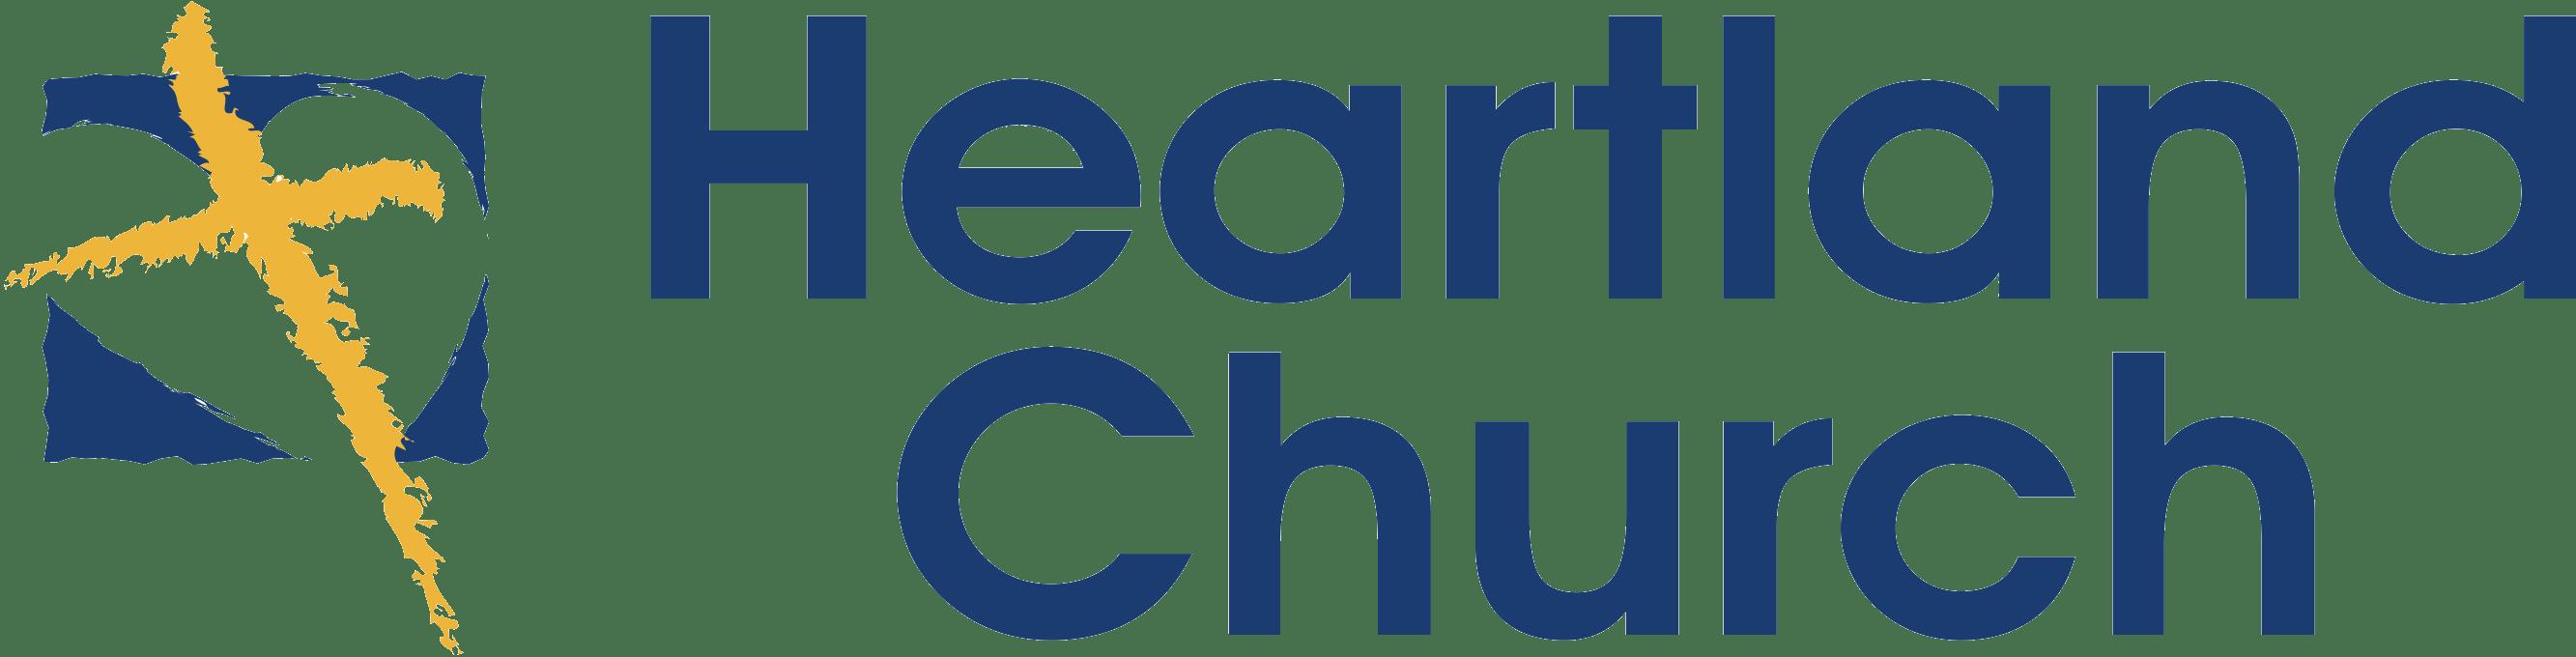 Heartland Community Baptist Church